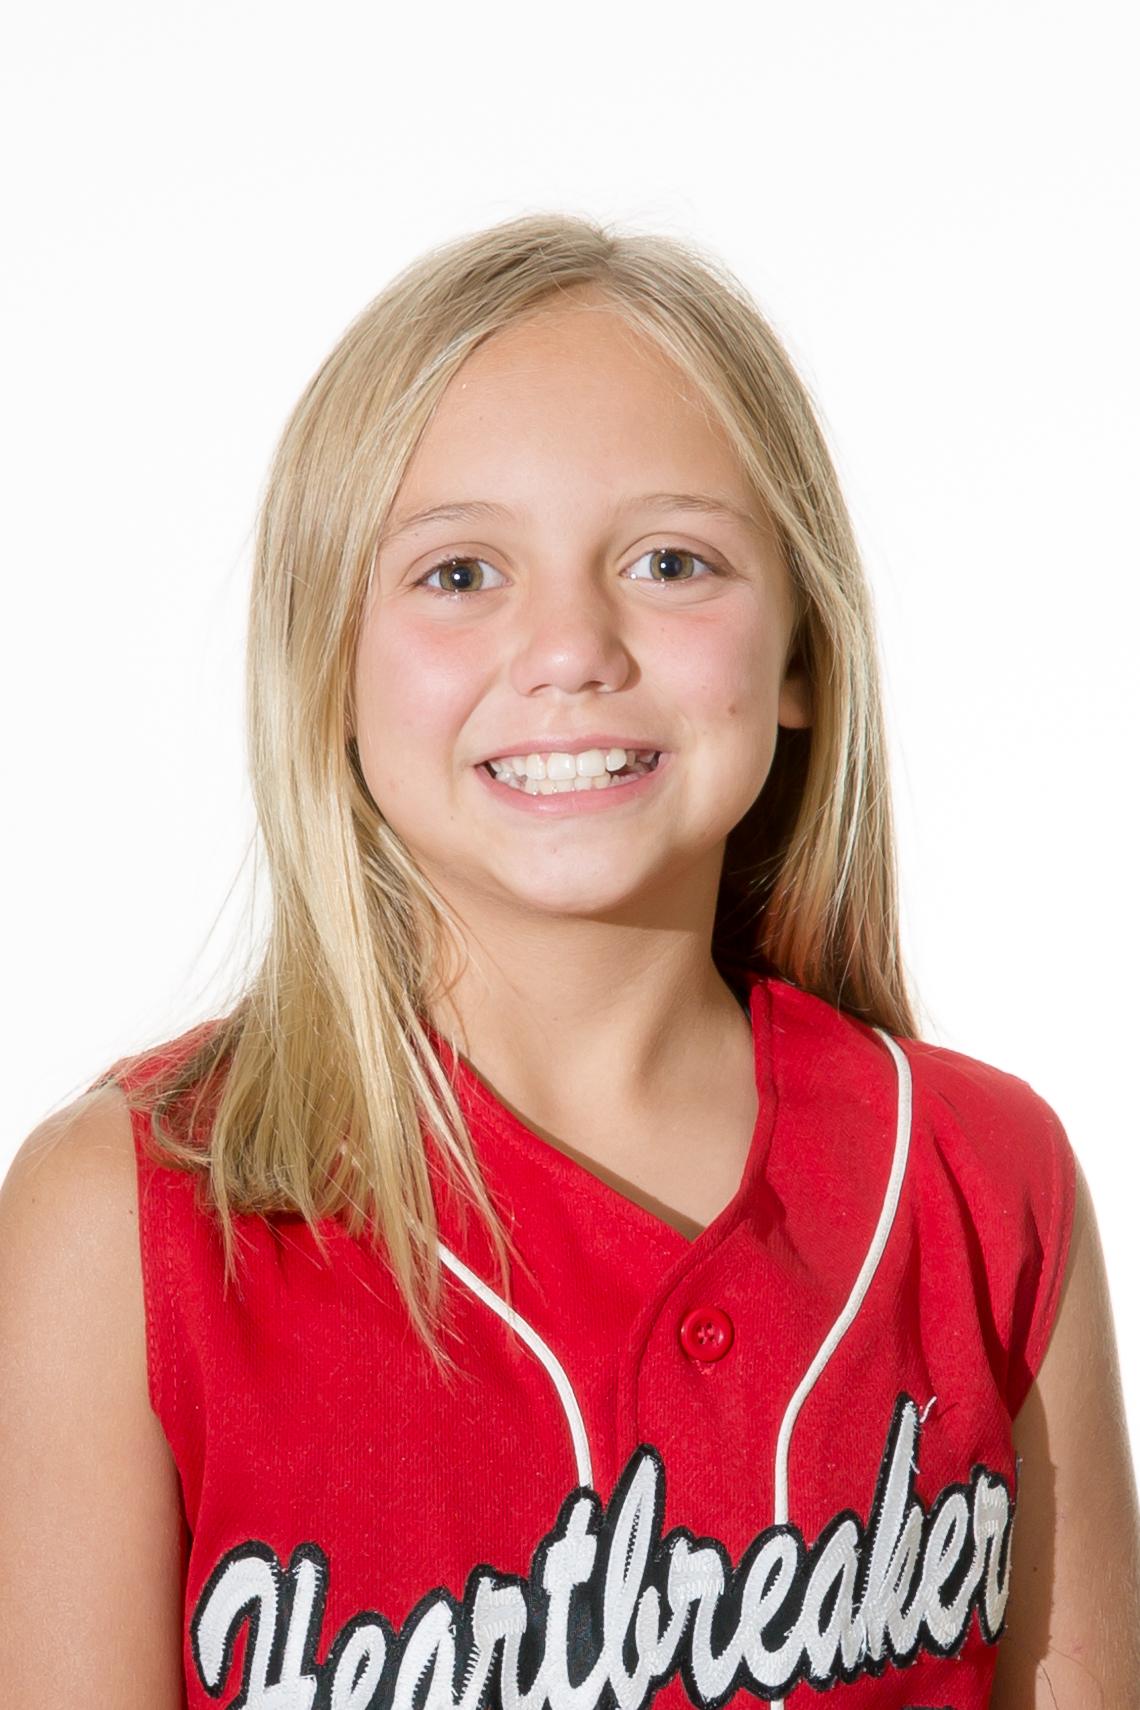 #2 Brooke Putnam